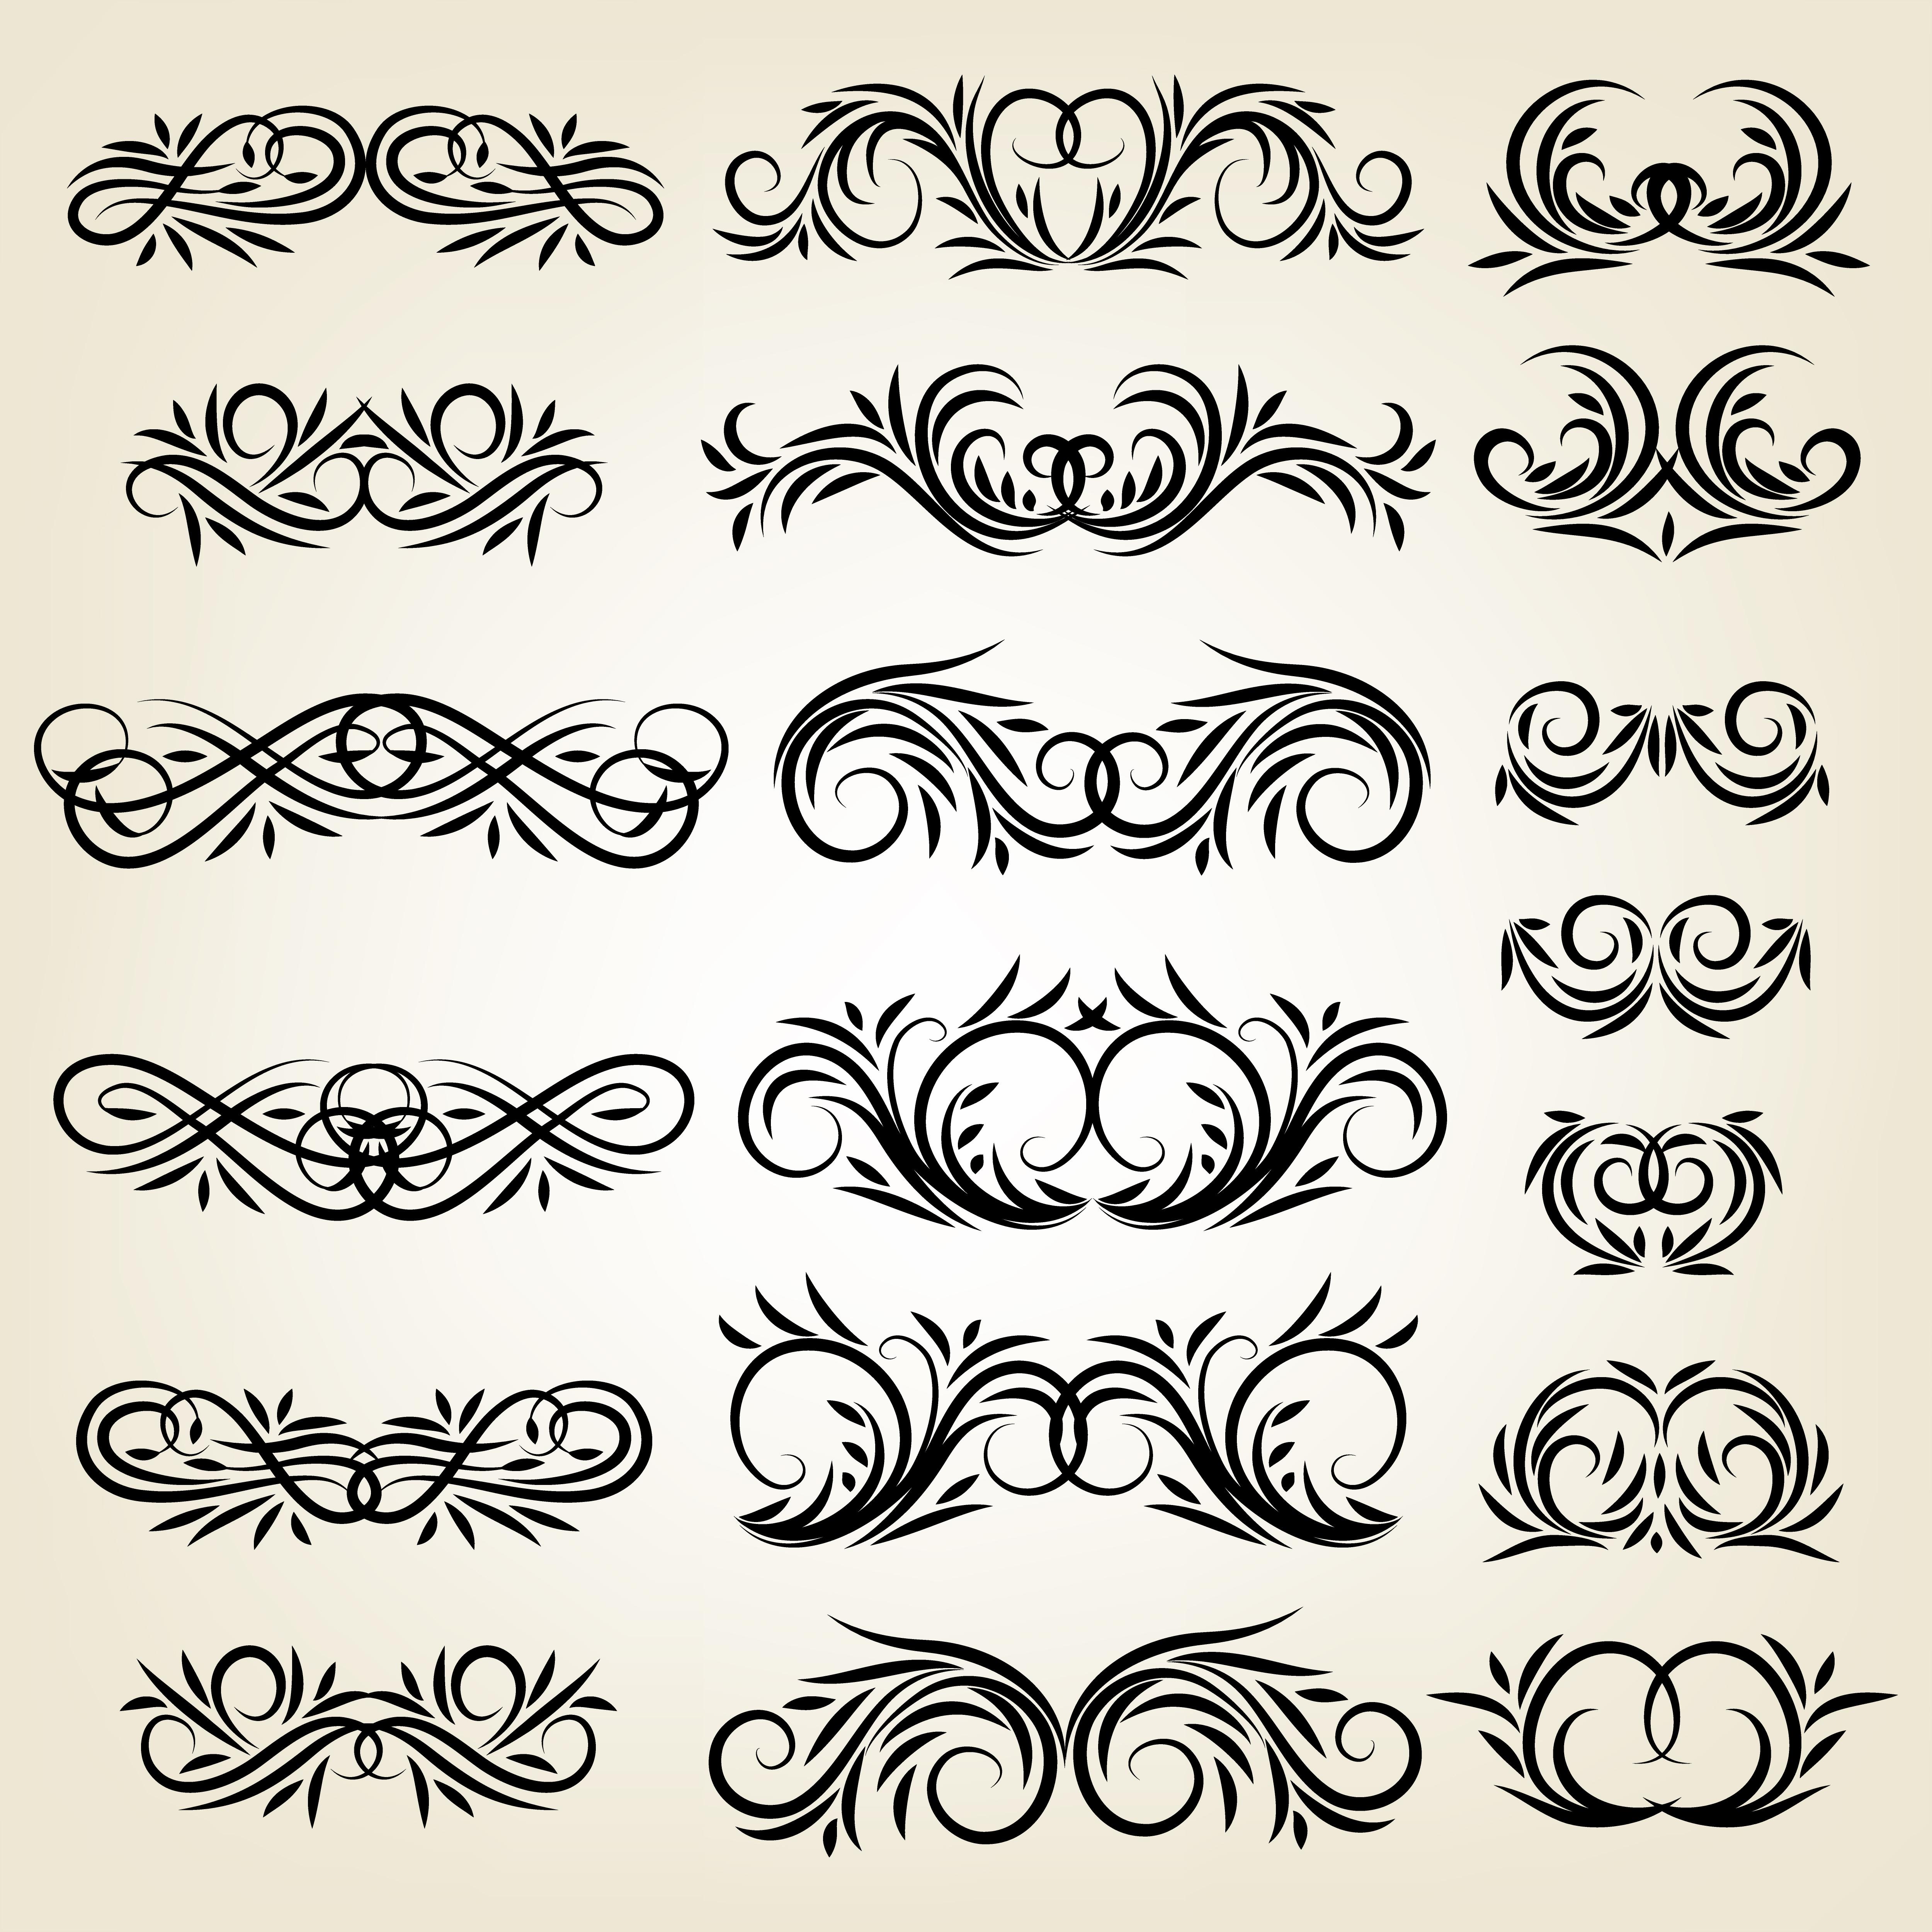 Vintage calligraphic swirl ornaments set - Download Free ...